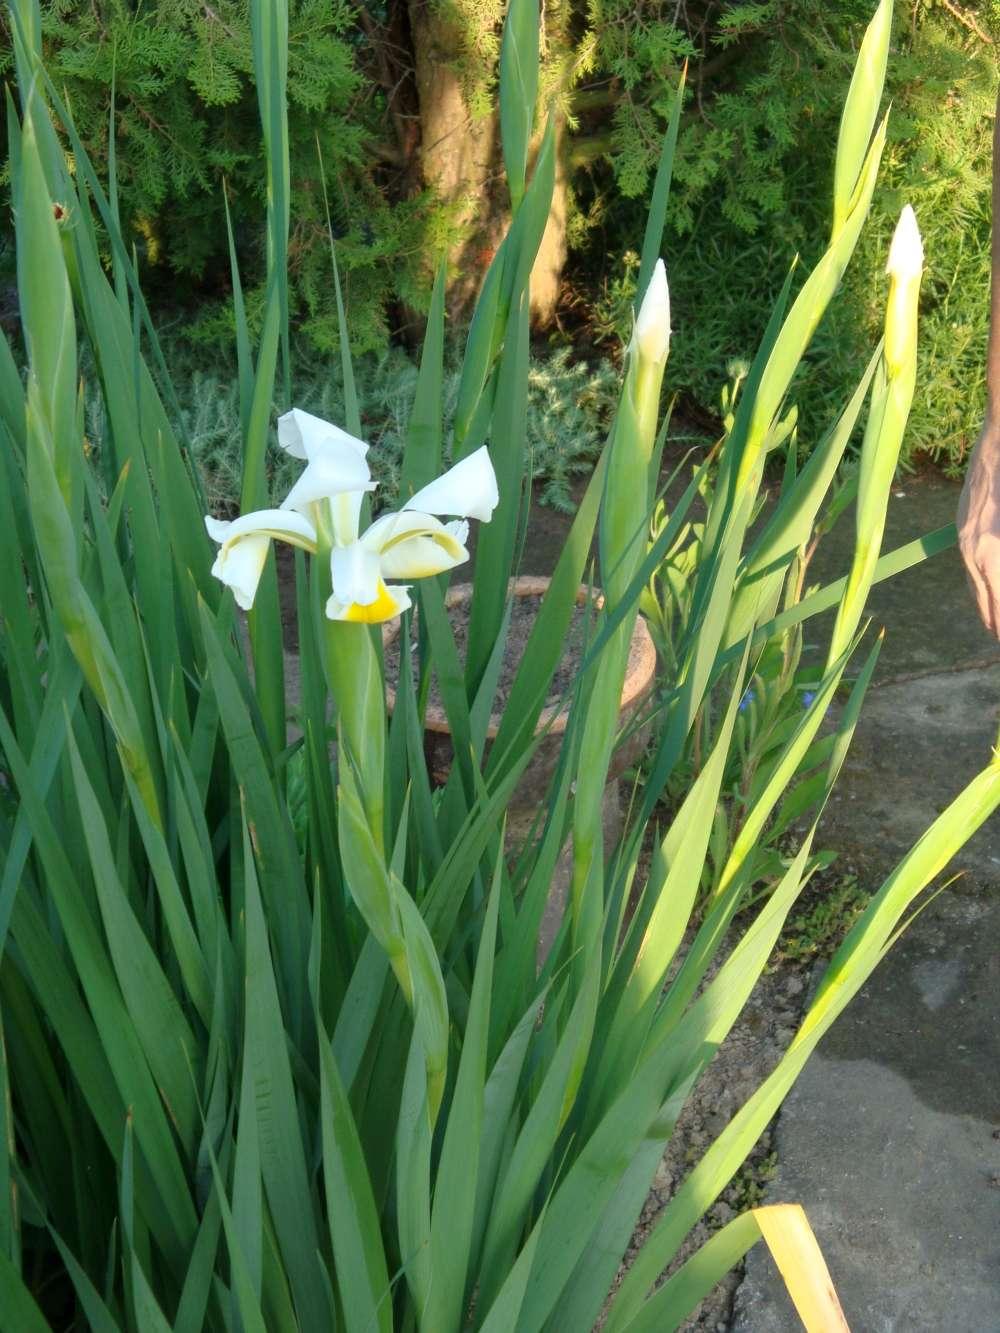 biely iris - Obrázok č. 3